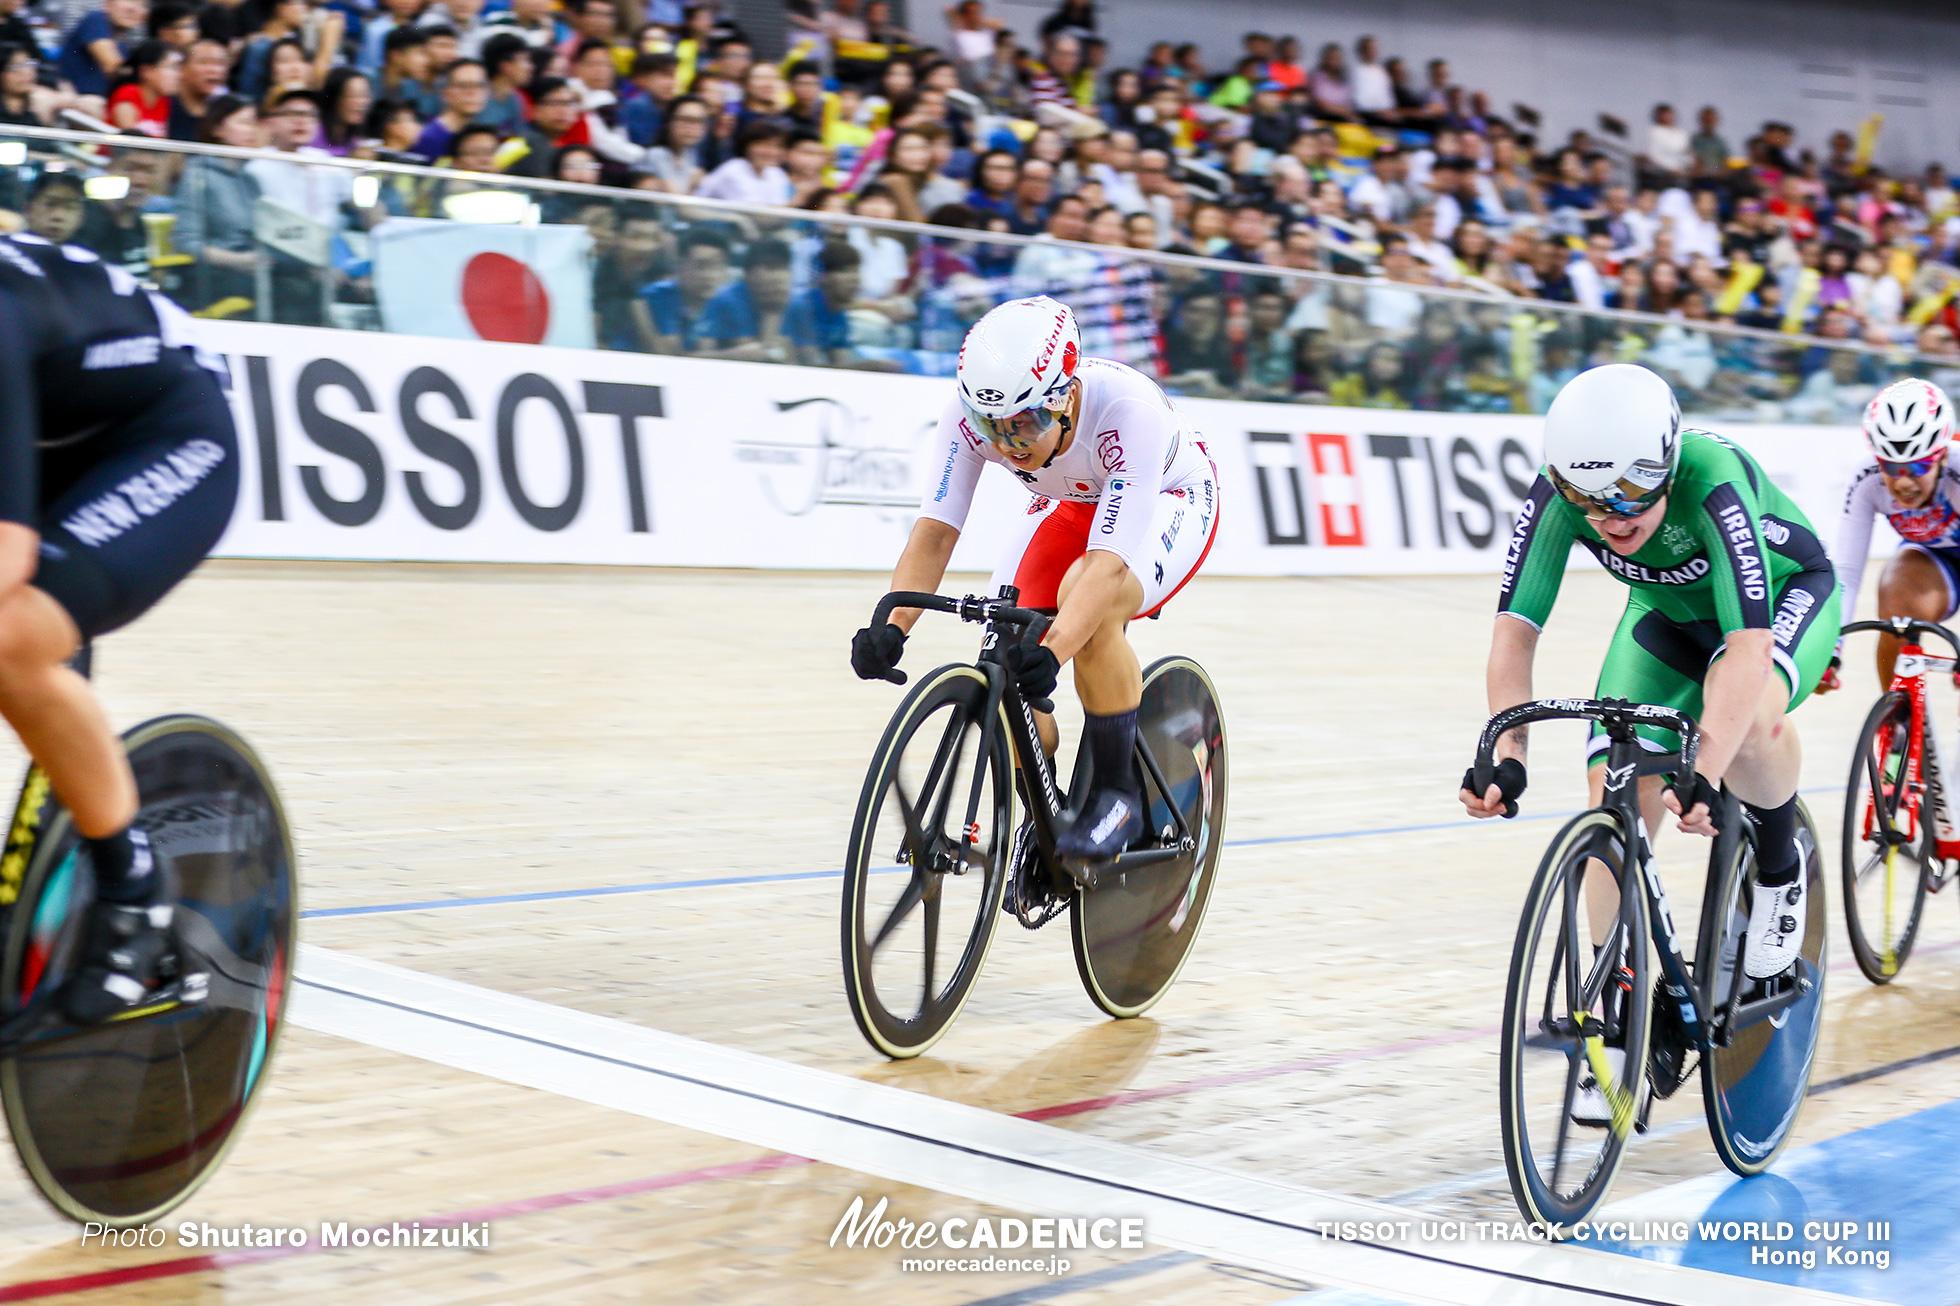 Point Race / Women's Omnium / TISSOT UCI TRACK CYCLING WORLD CUP III, Hong Kong